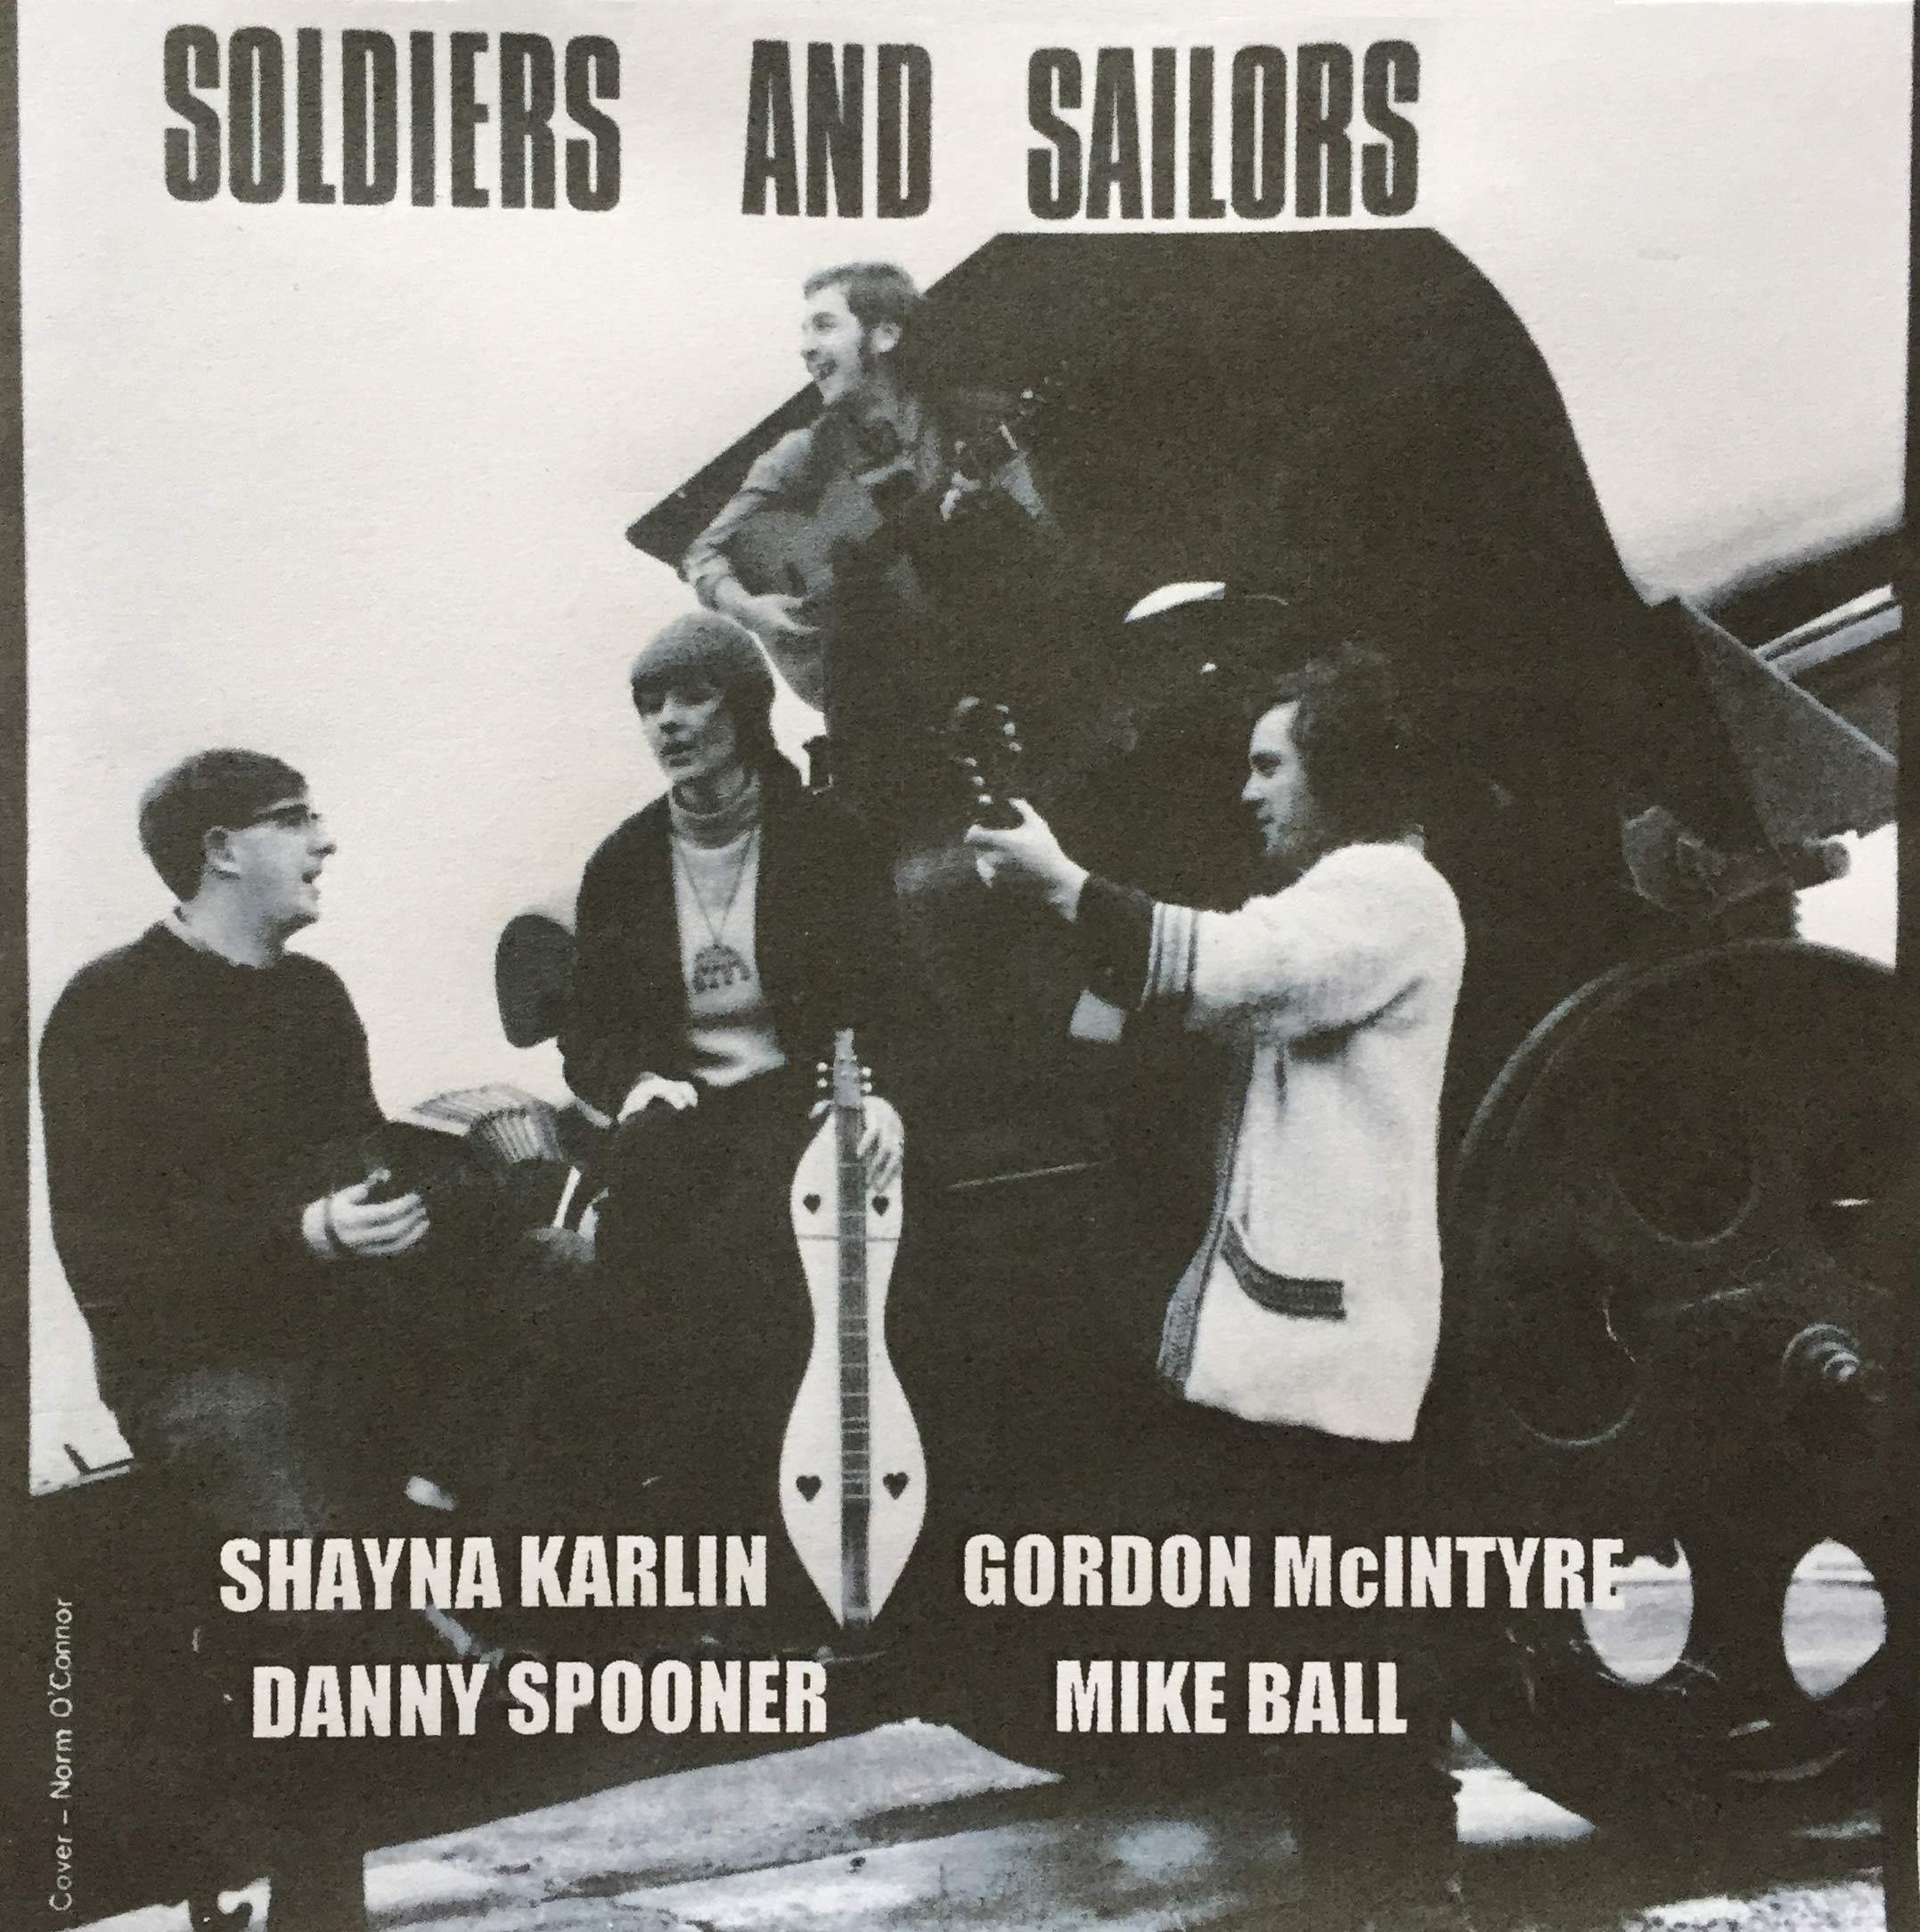 Danny Spooner - Order Online